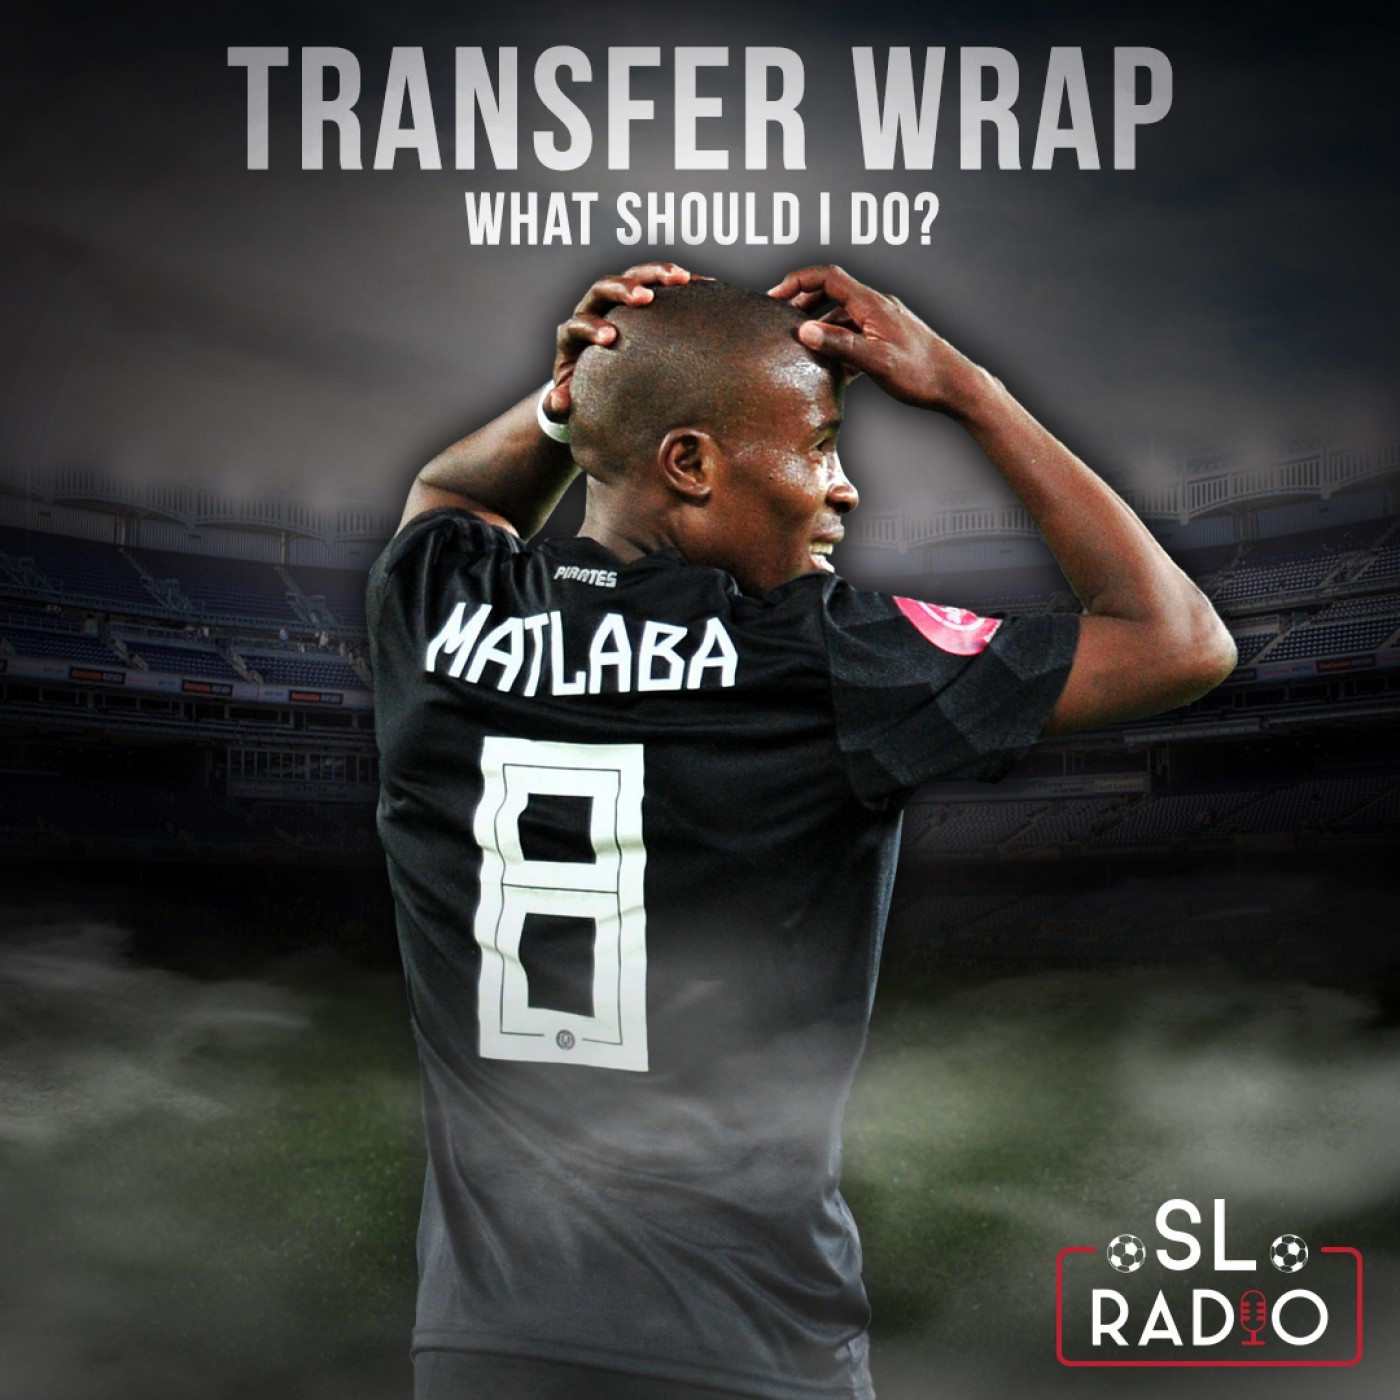 Transfer Wrap Ep 27 - Chiefs Next Stop For Matlaba?